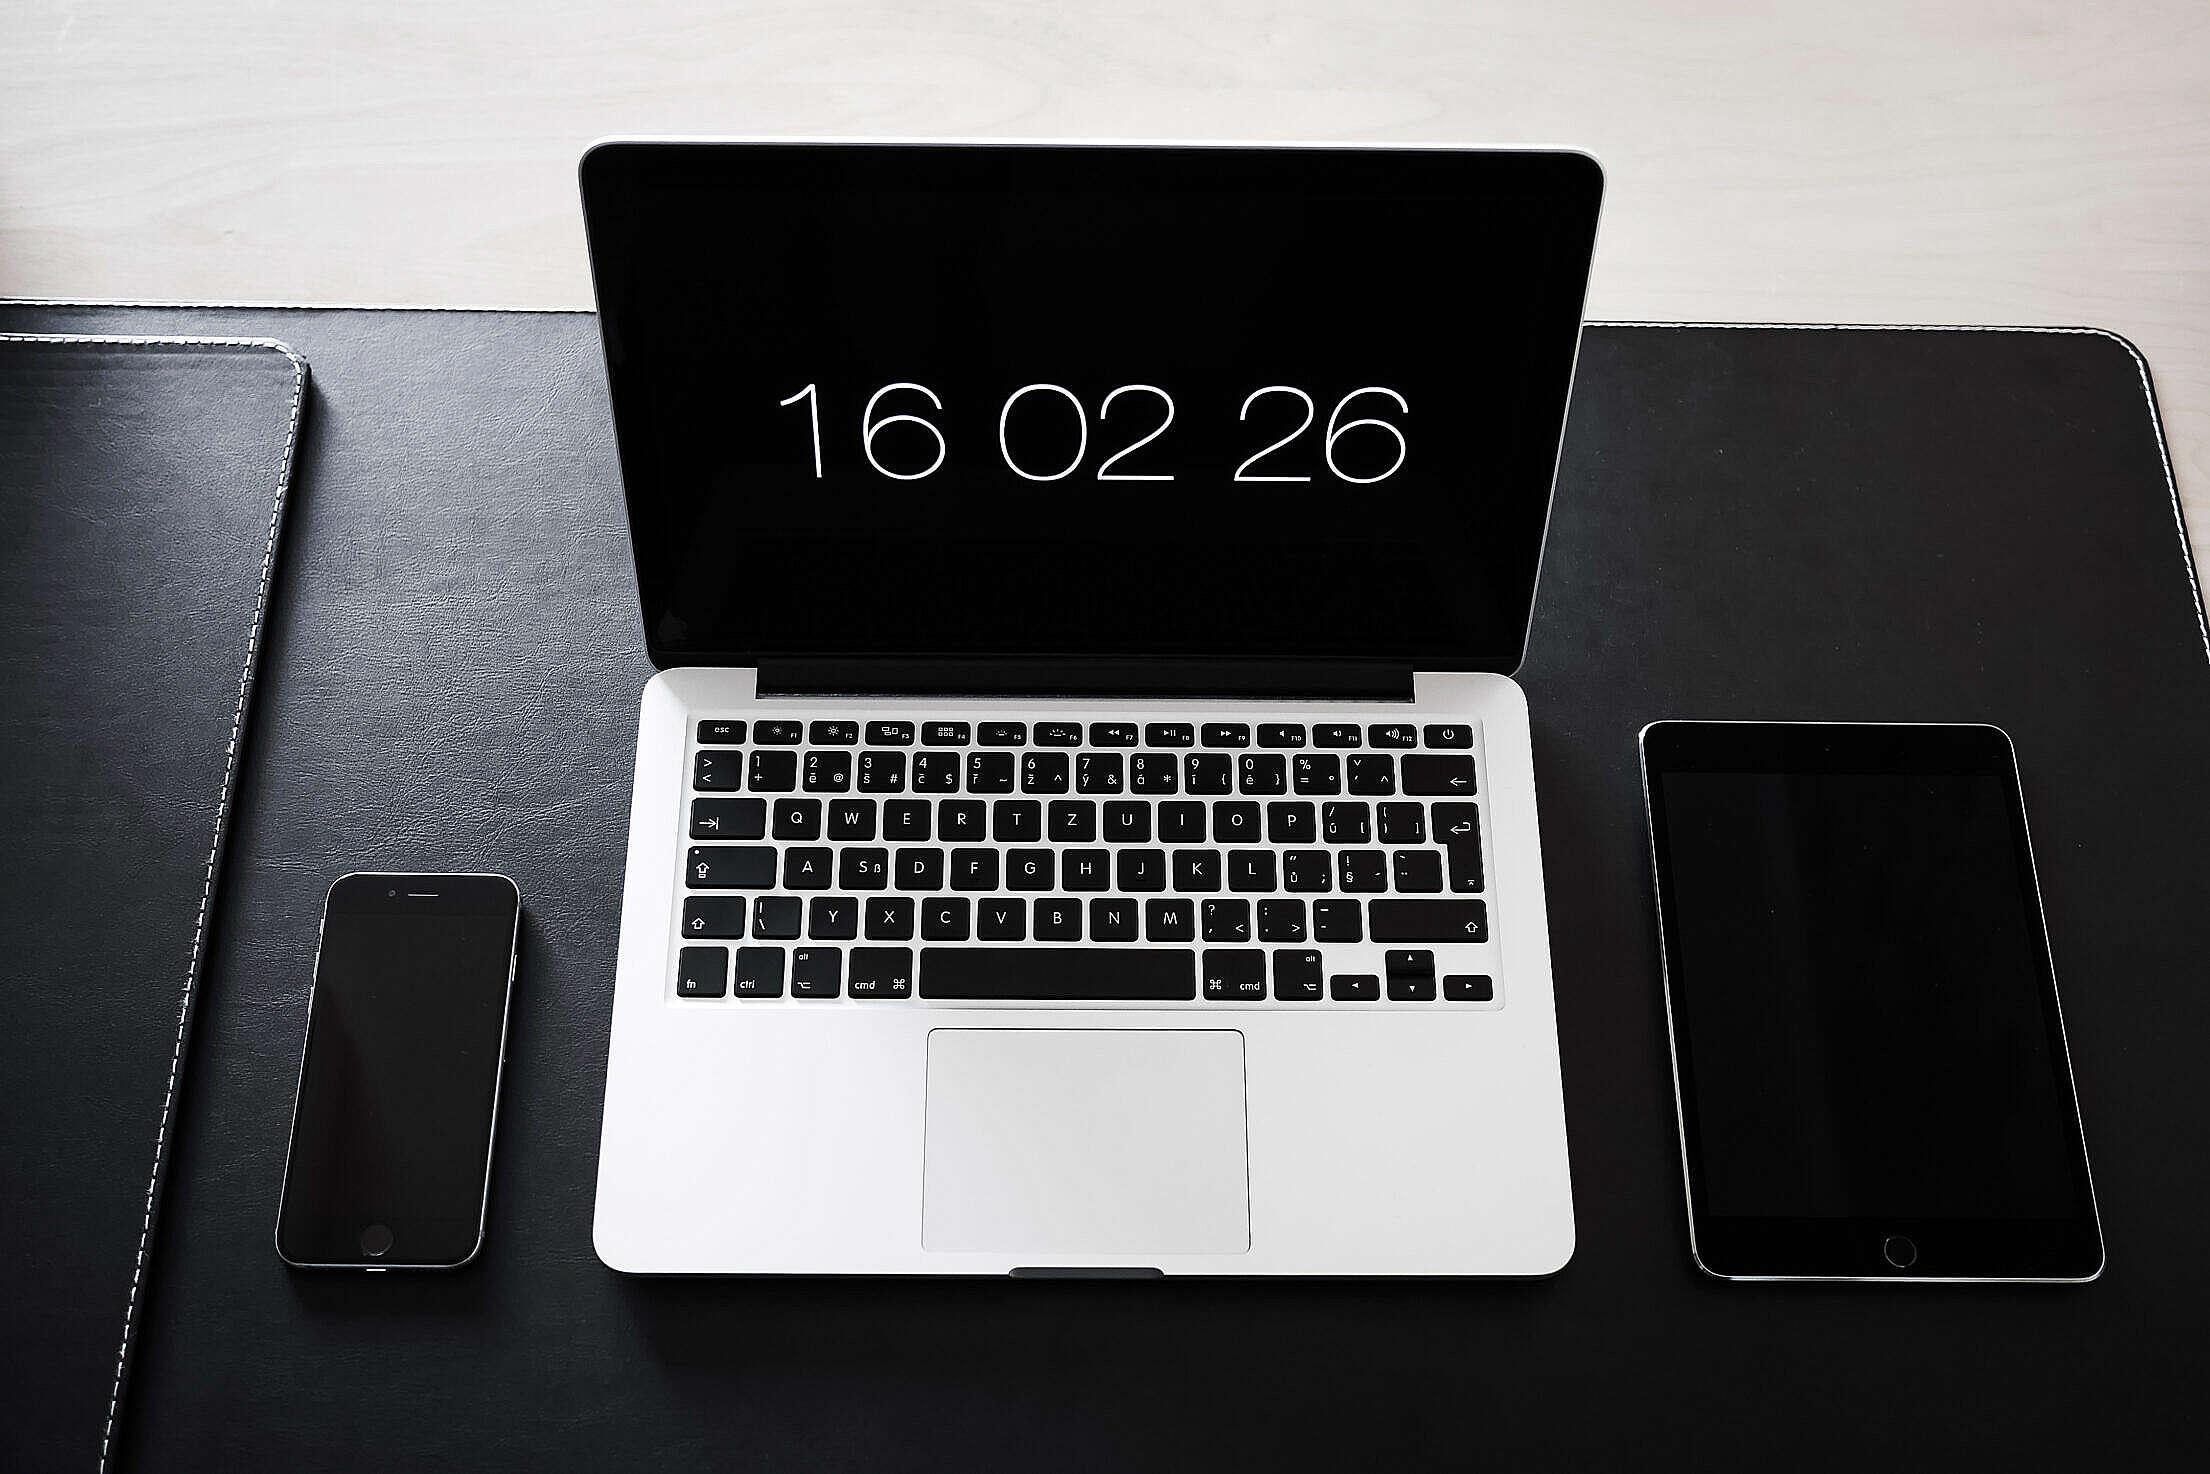 Simple Minimalistic Home Office Workspace Setup Free Stock Photo